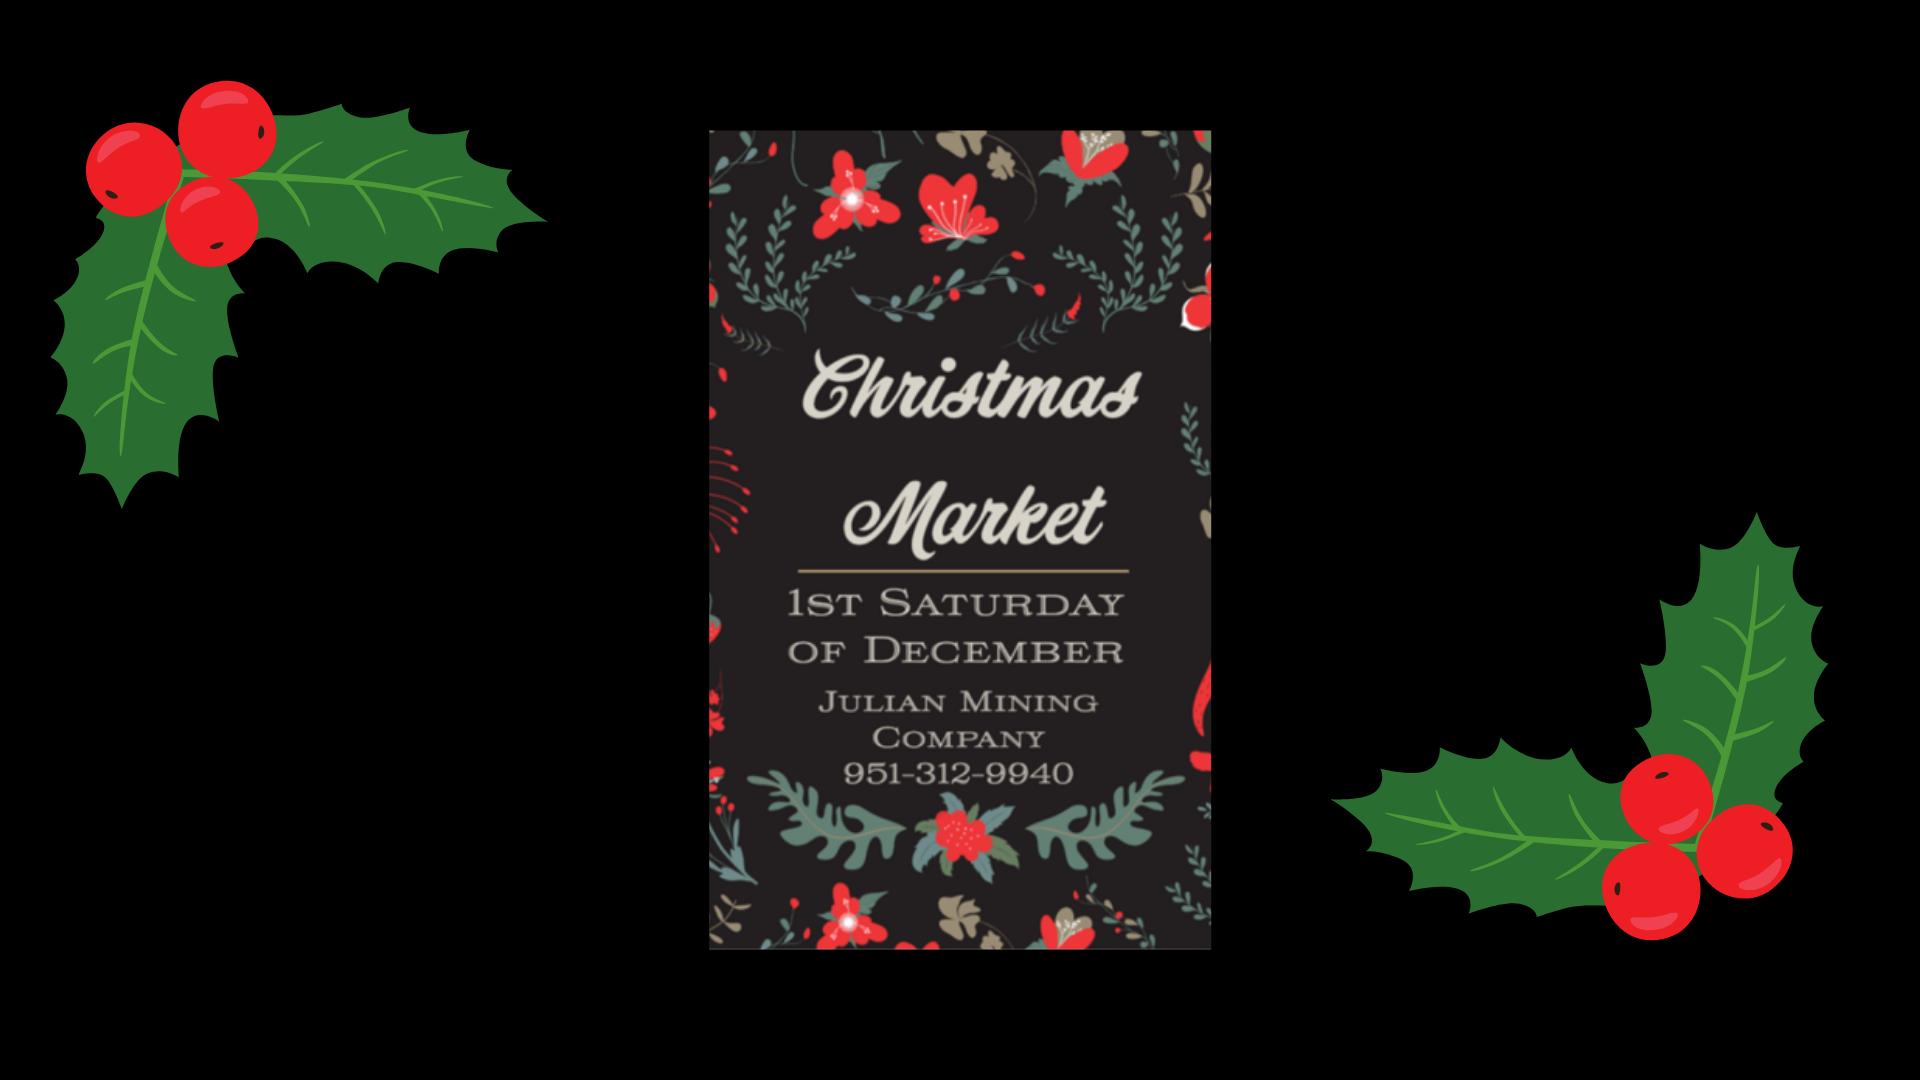 2021 Christmas Market fb cover photo